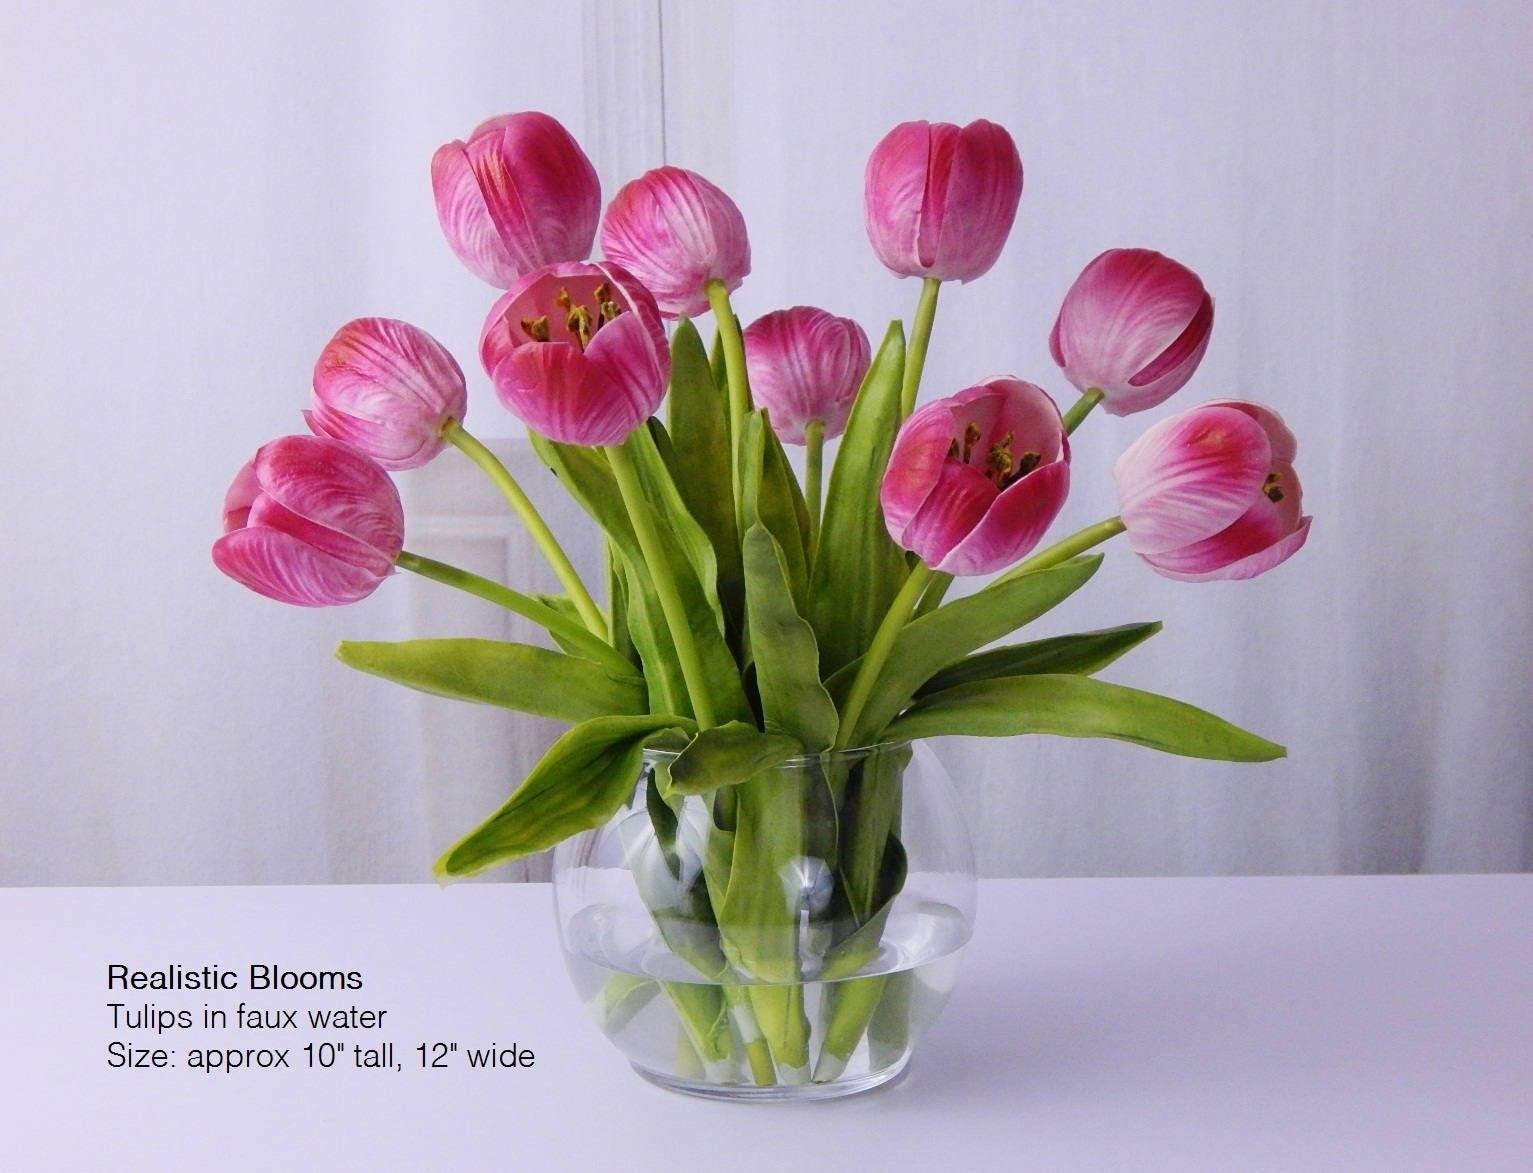 Pink tuliptulips silk floral arrangement faux water acrylic pink tuliptulips silk floral arrangement faux water acrylic illusion glass vase real touch flowers centerpiece gift home decor reviewsmspy